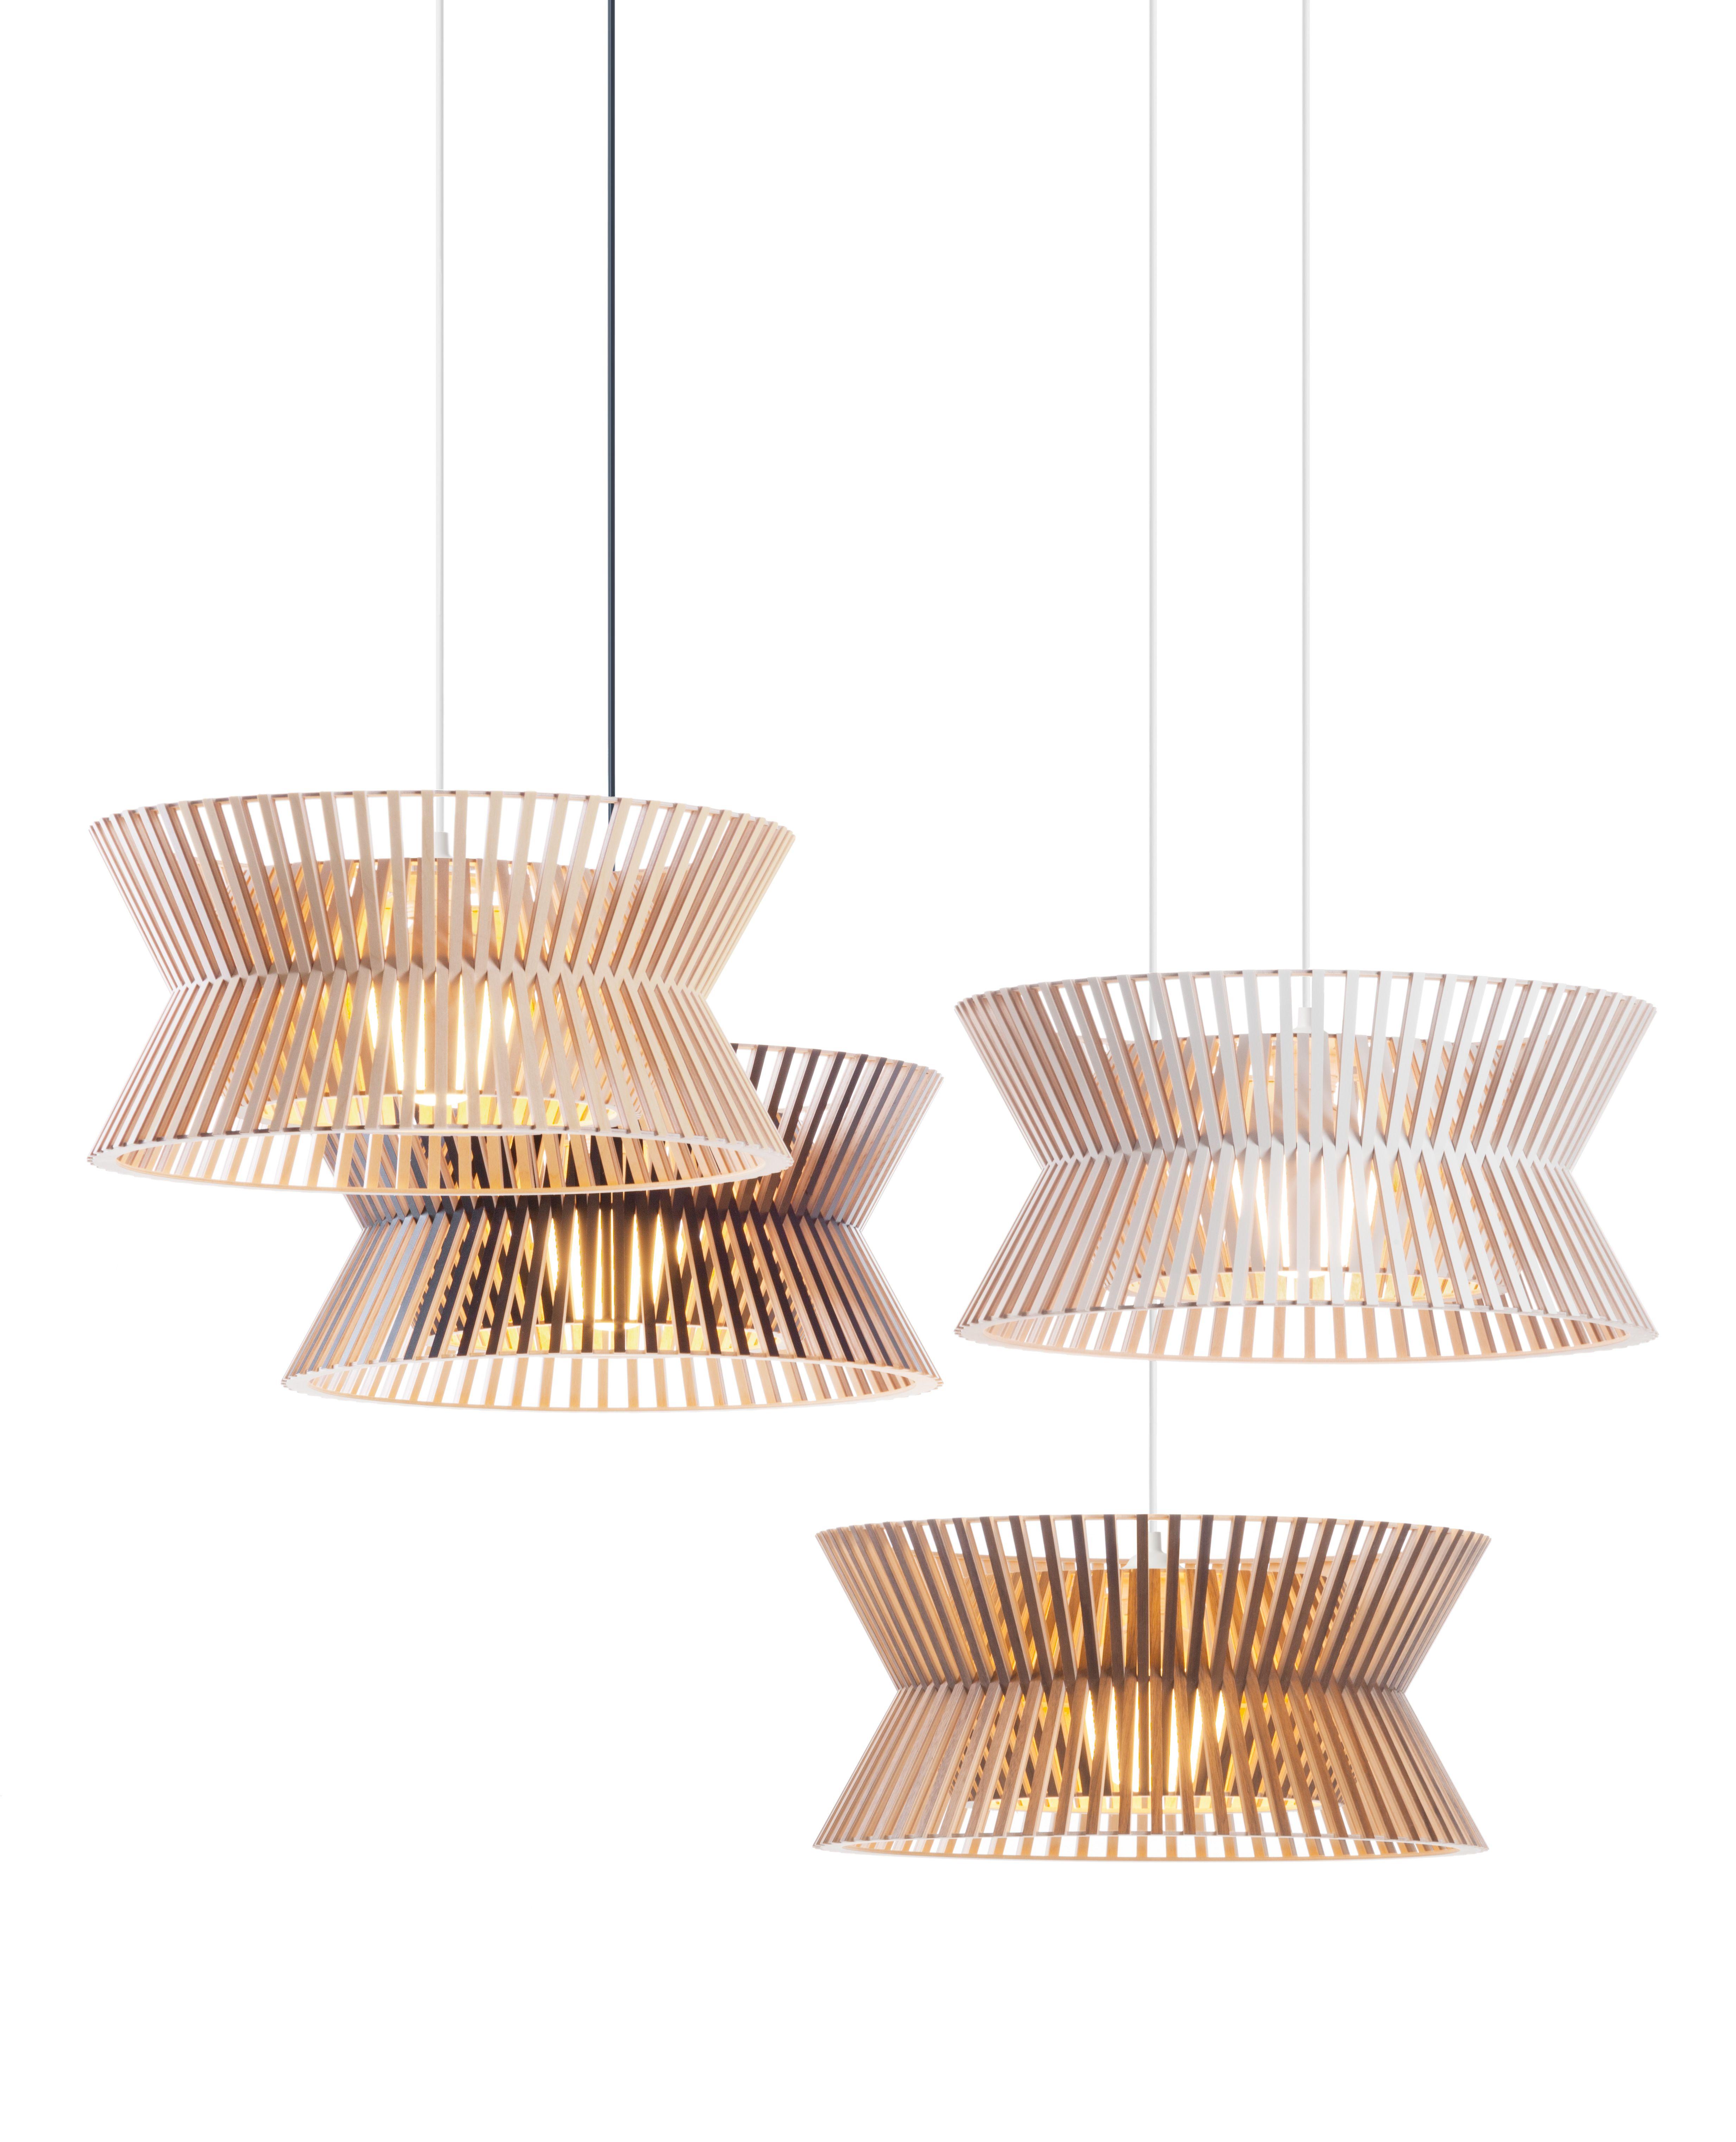 Kontro Hängeleuchten aus Holz / wooden lamps by Secto